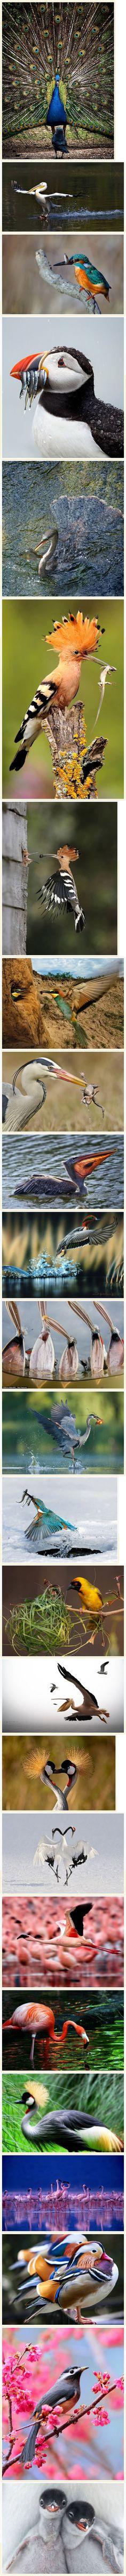 beautiful birds#Wildlife #Photography #Birds